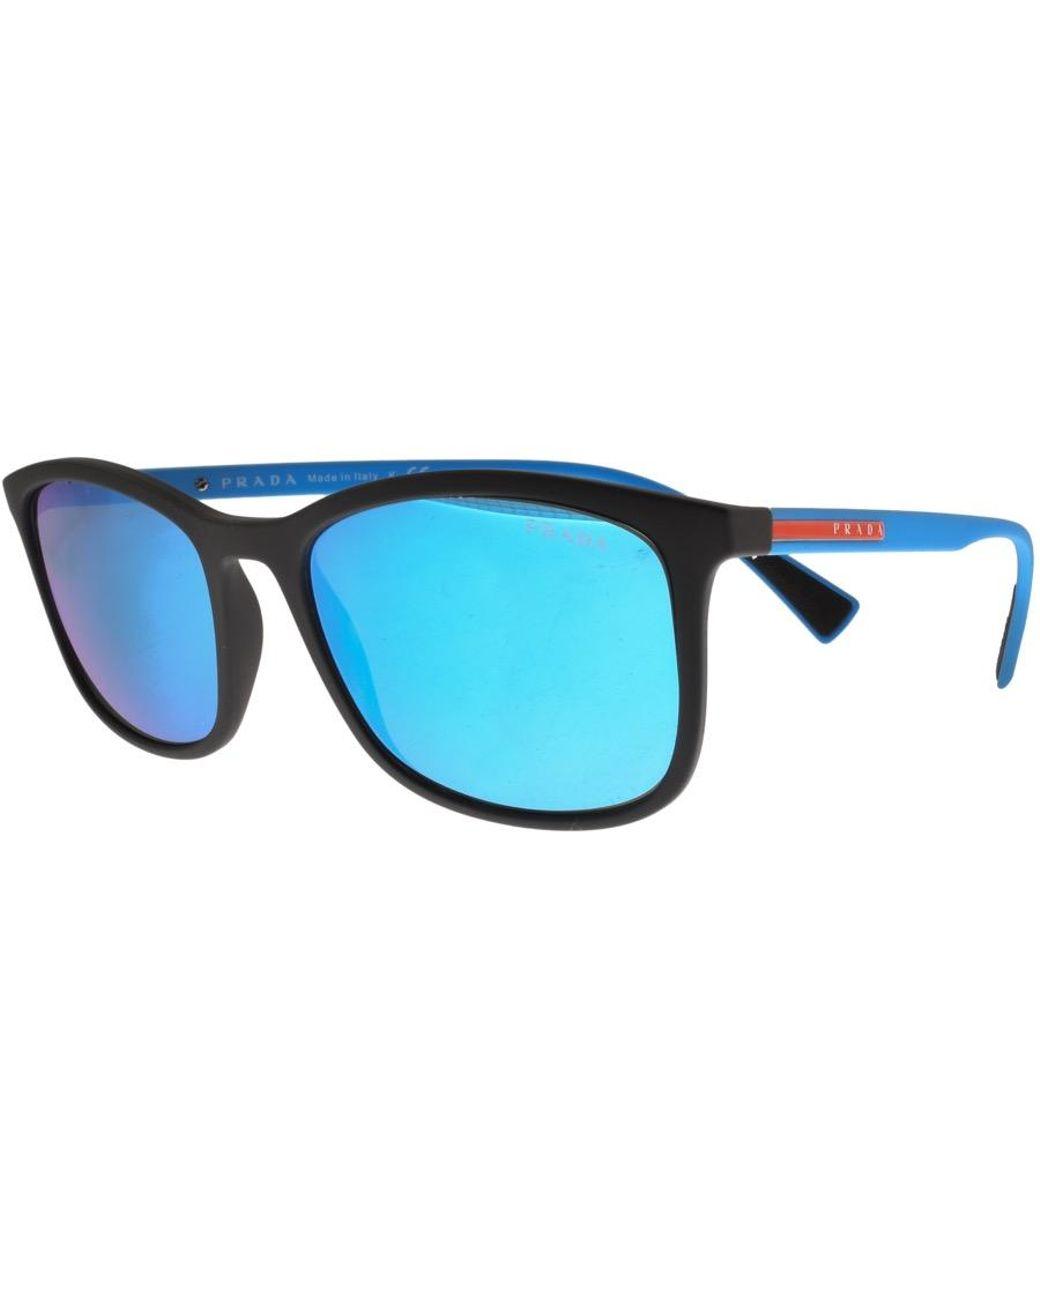 48e02ee53aa Prada Linea Rossa Sunglasses Blue in Blue for Men - Lyst